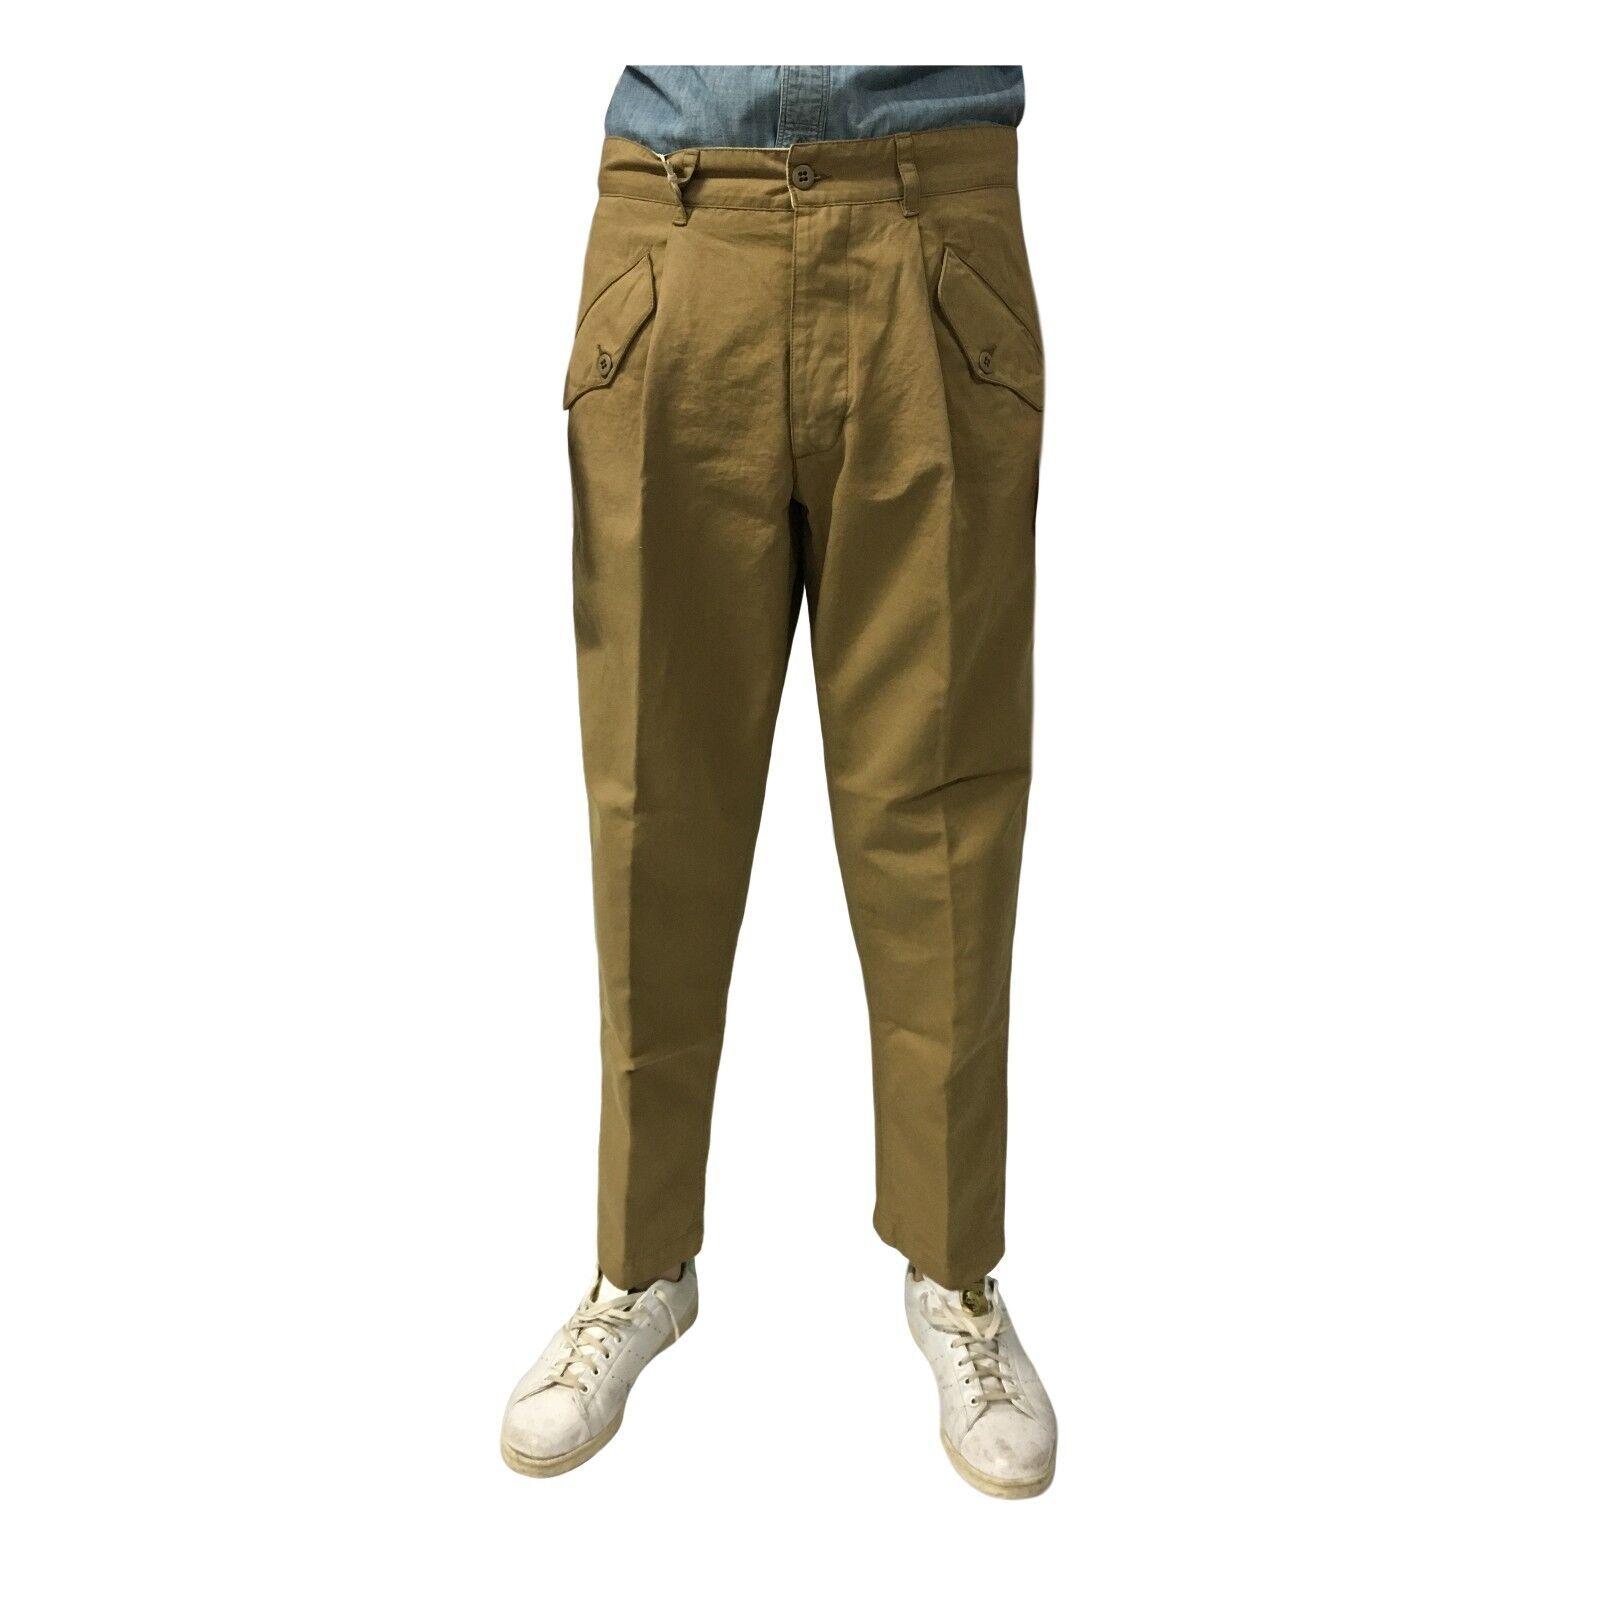 MANIFATTURA CECCARELLI men's trousers camel 6518 76% cotton 24% linen